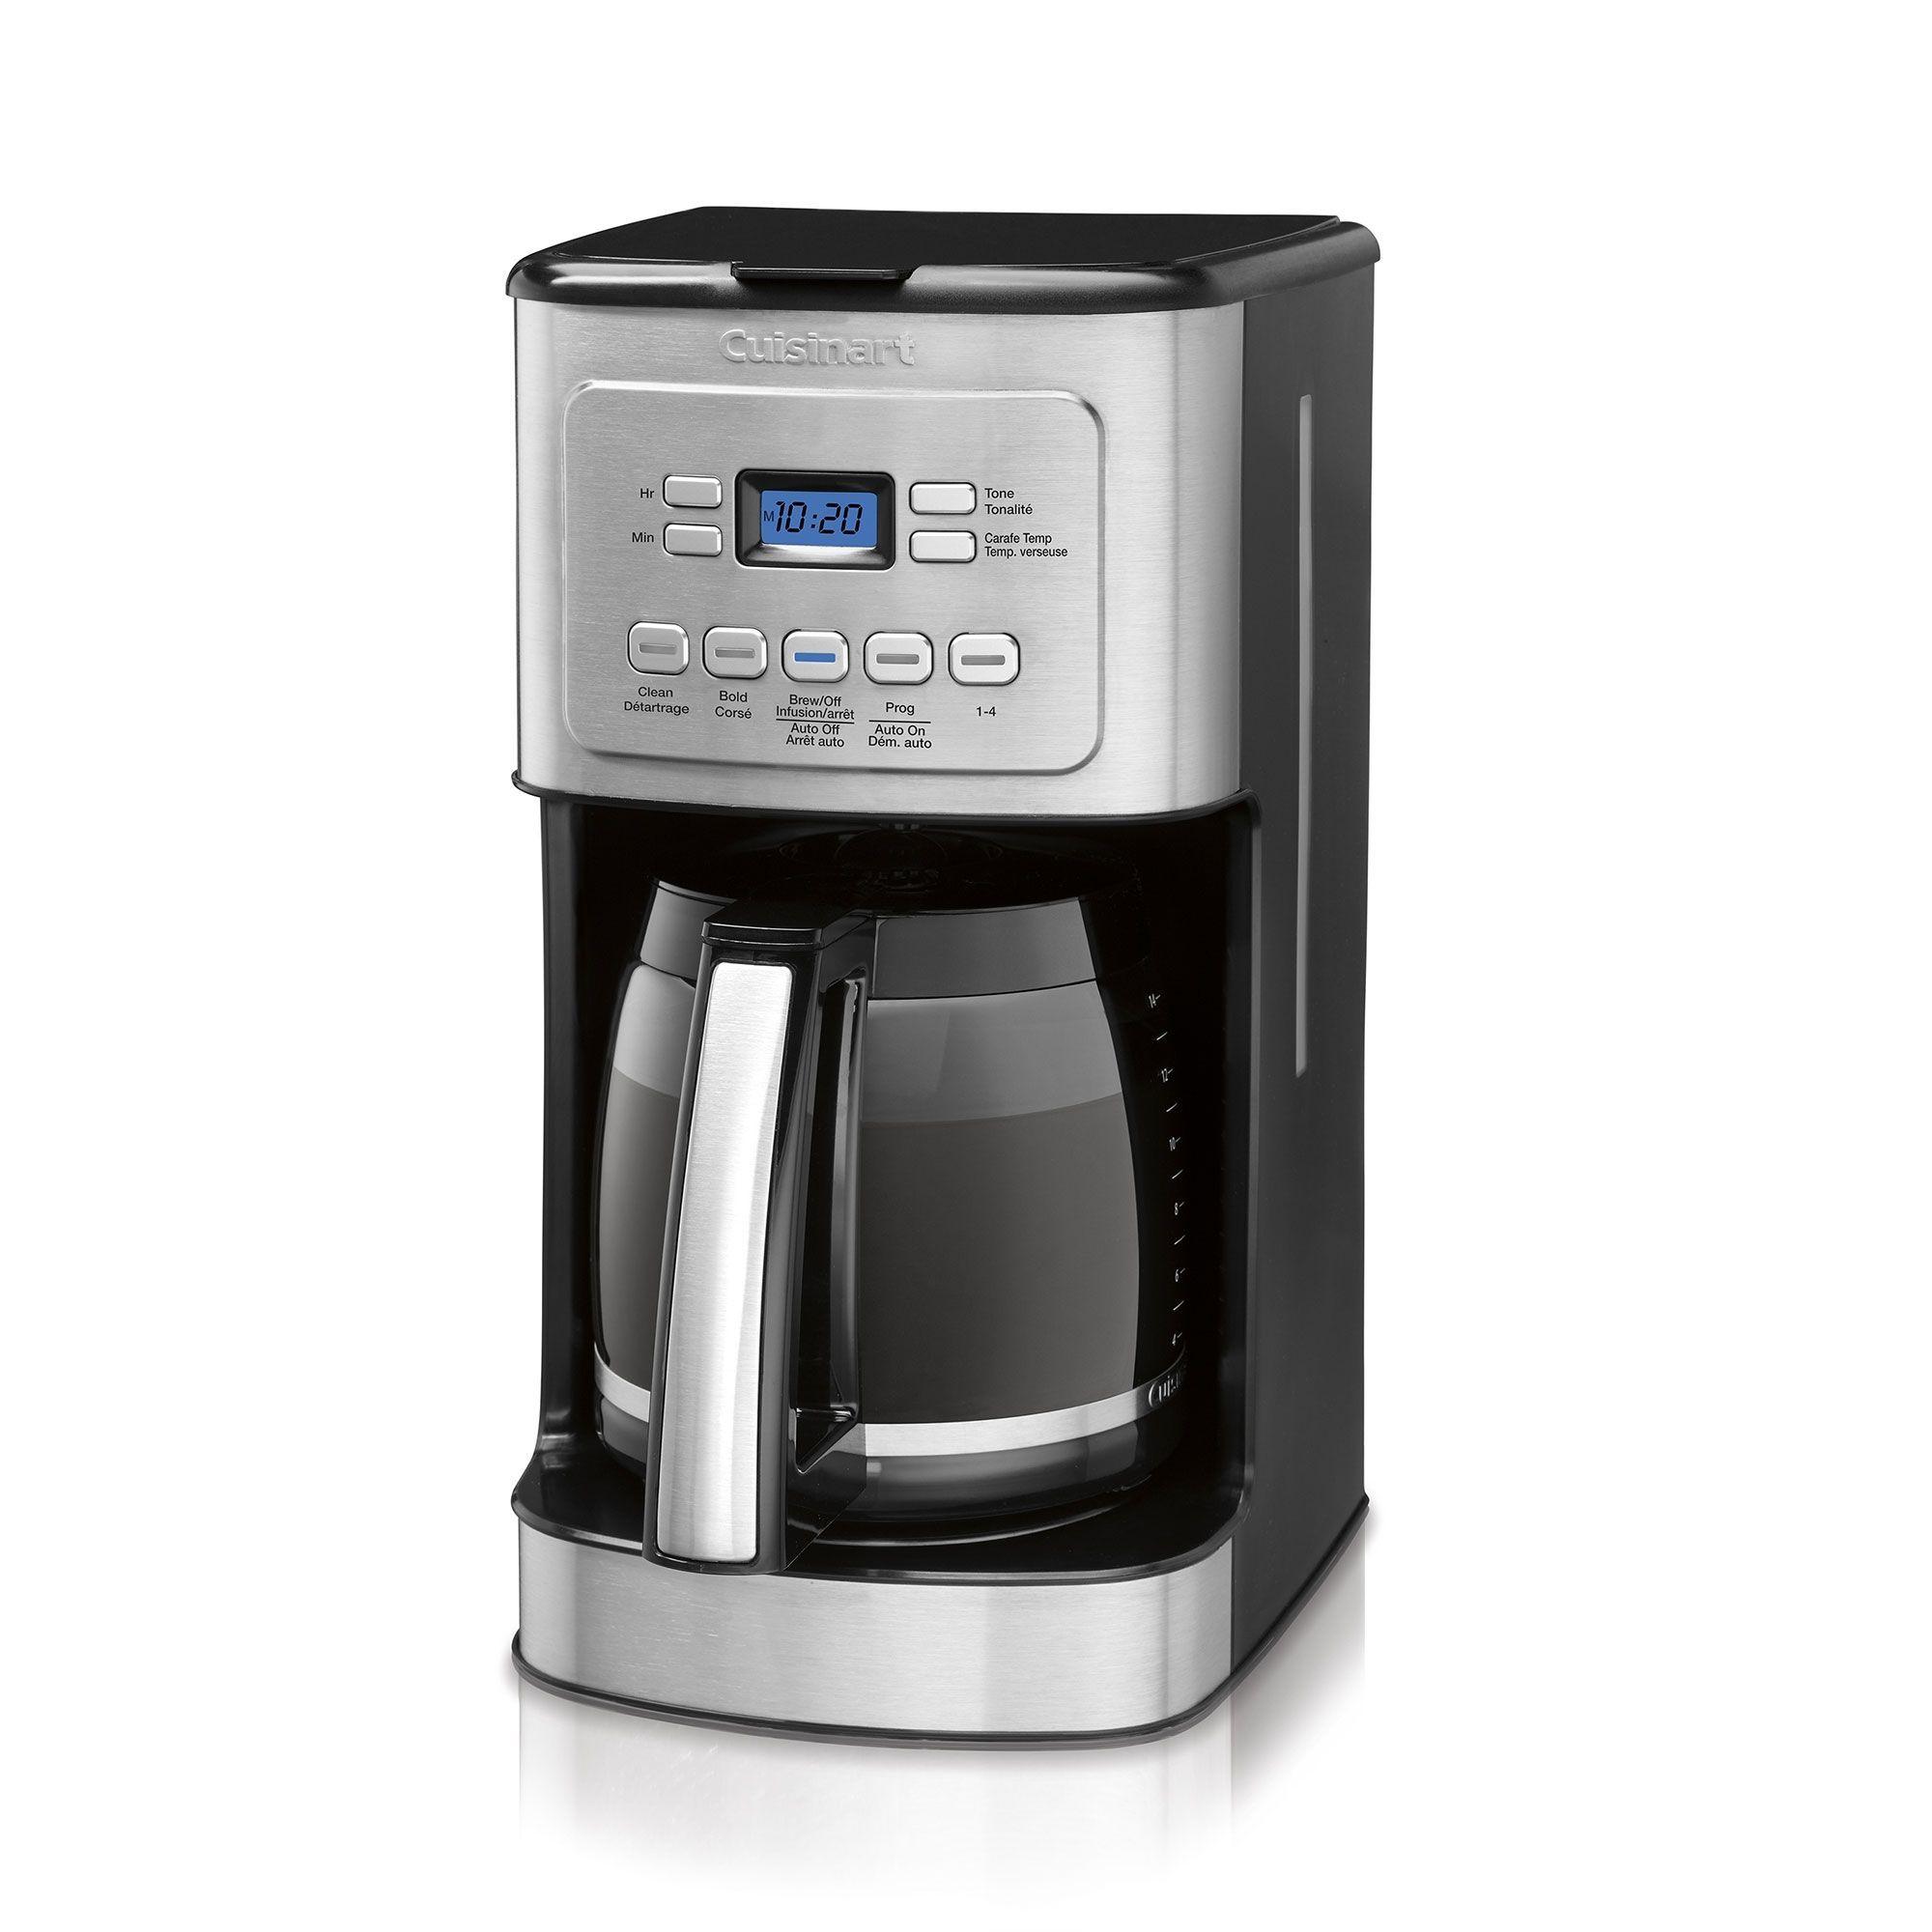 Automatic Espresso Coffee Makers Review Filterkaffeemaschine Kaffeemaschine